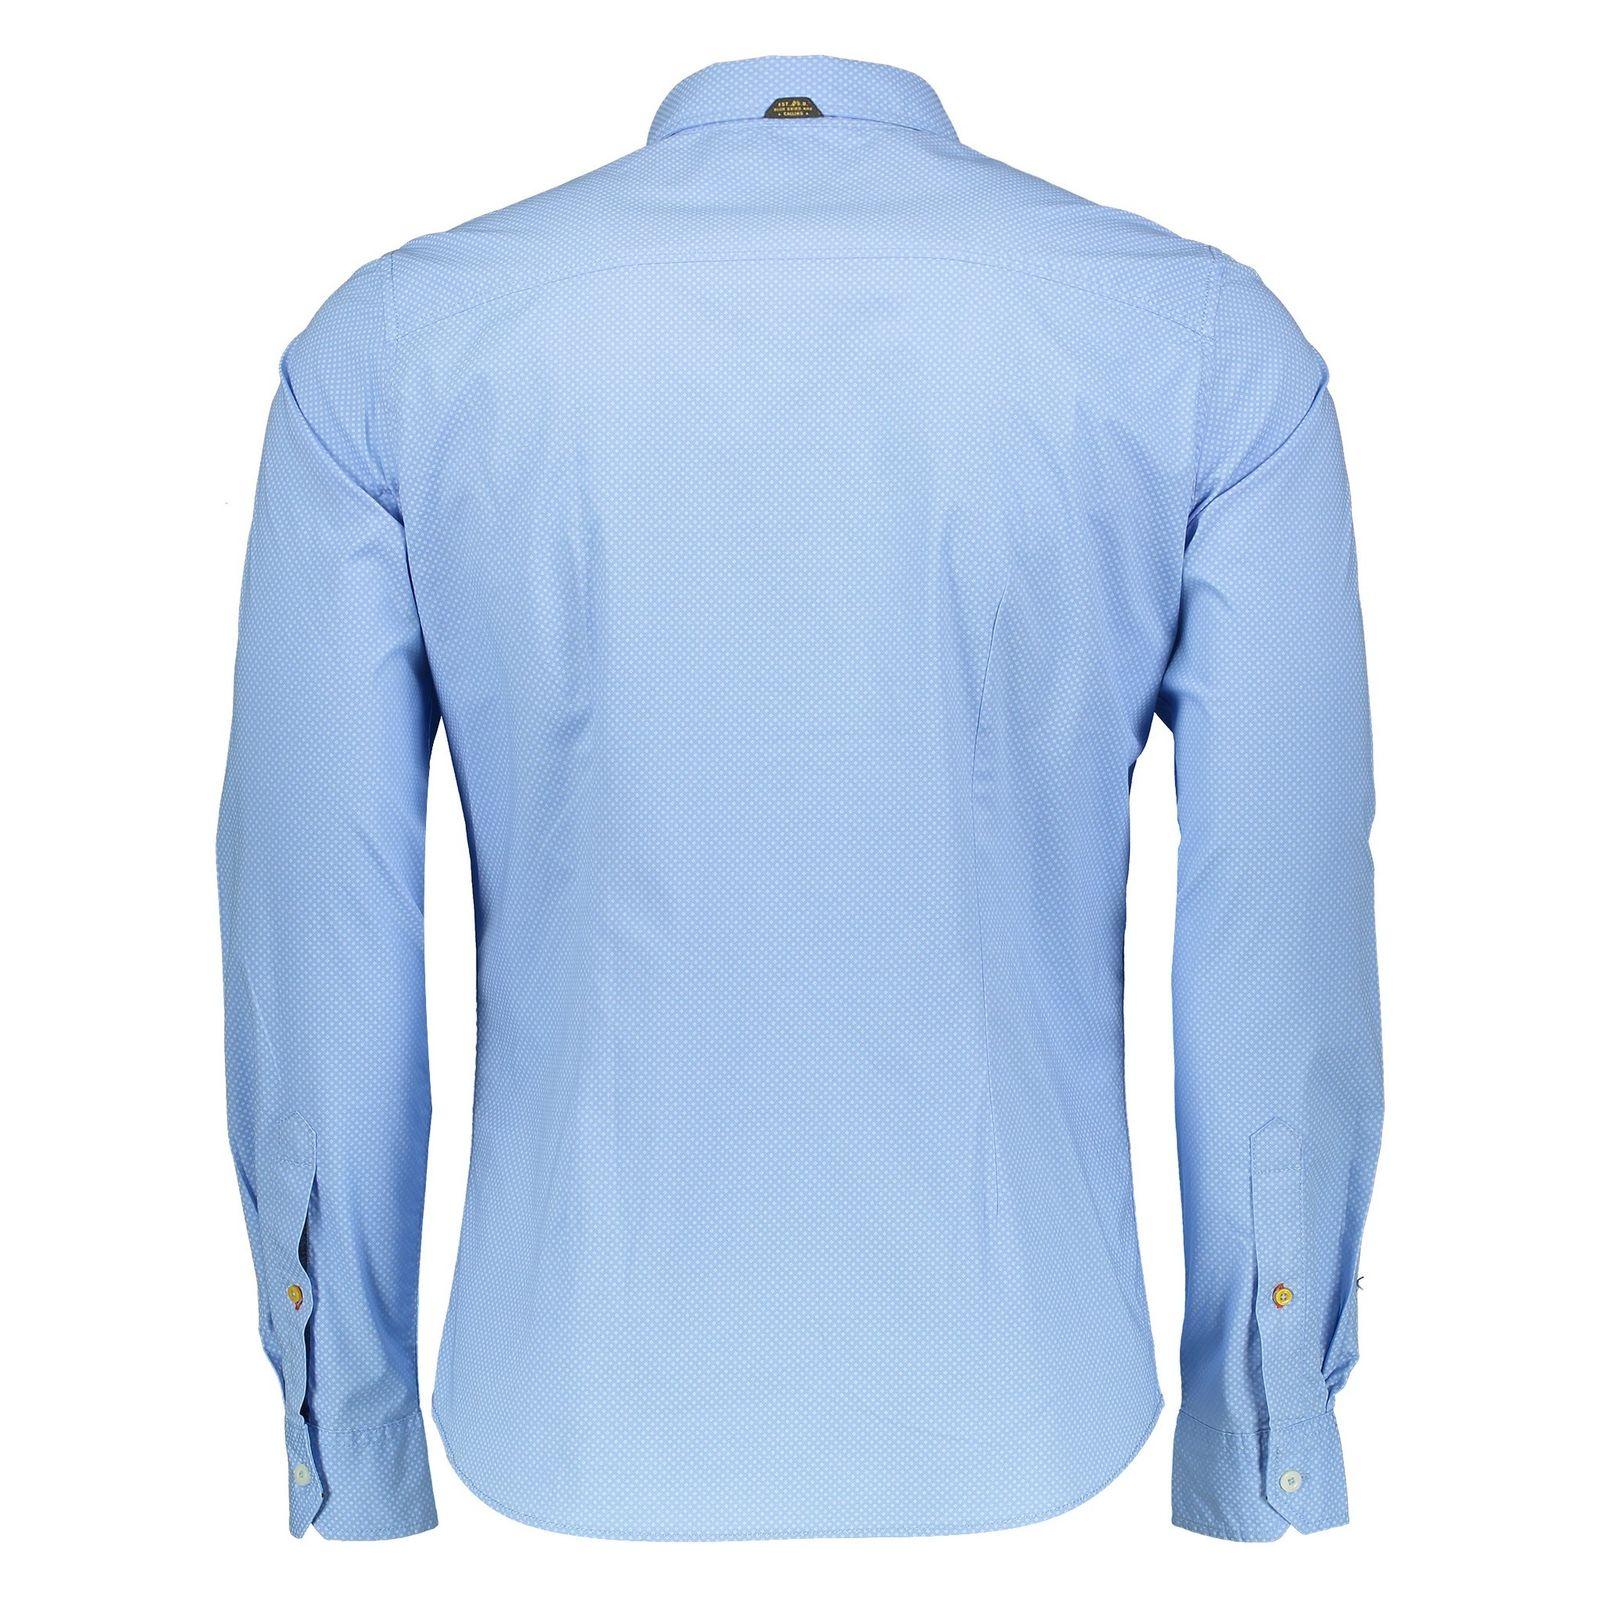 پیراهن نخی آستین بلند مردانه - اس.اولیور - آبي روشن - 2